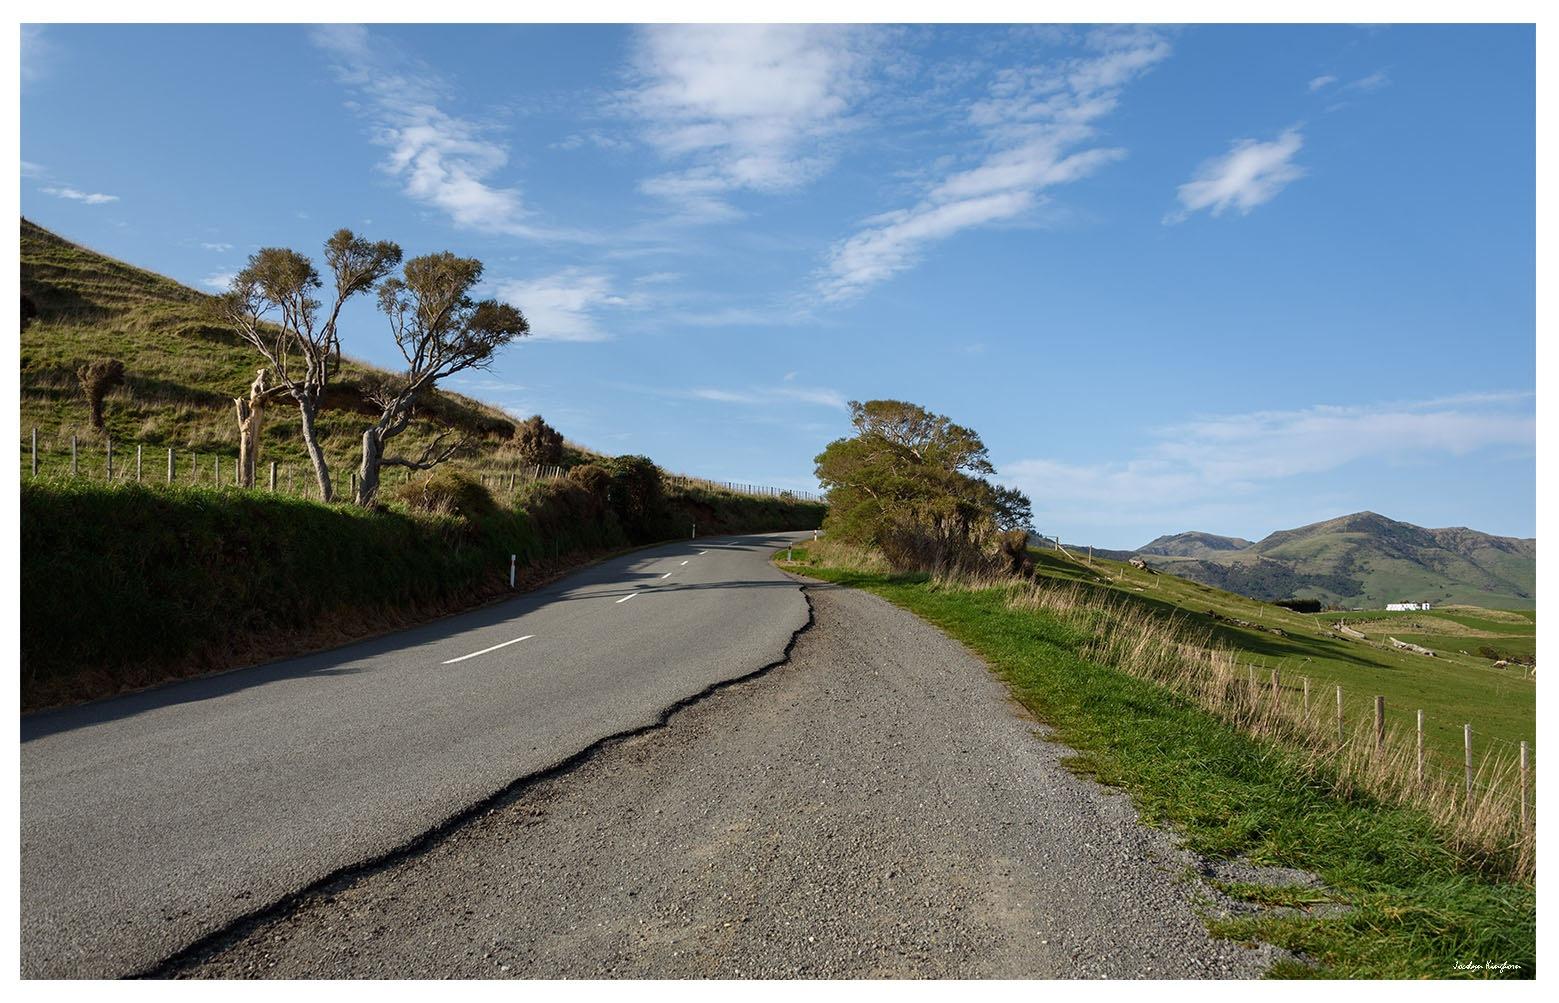 On the Road Home by Jocelyn Kinghorn